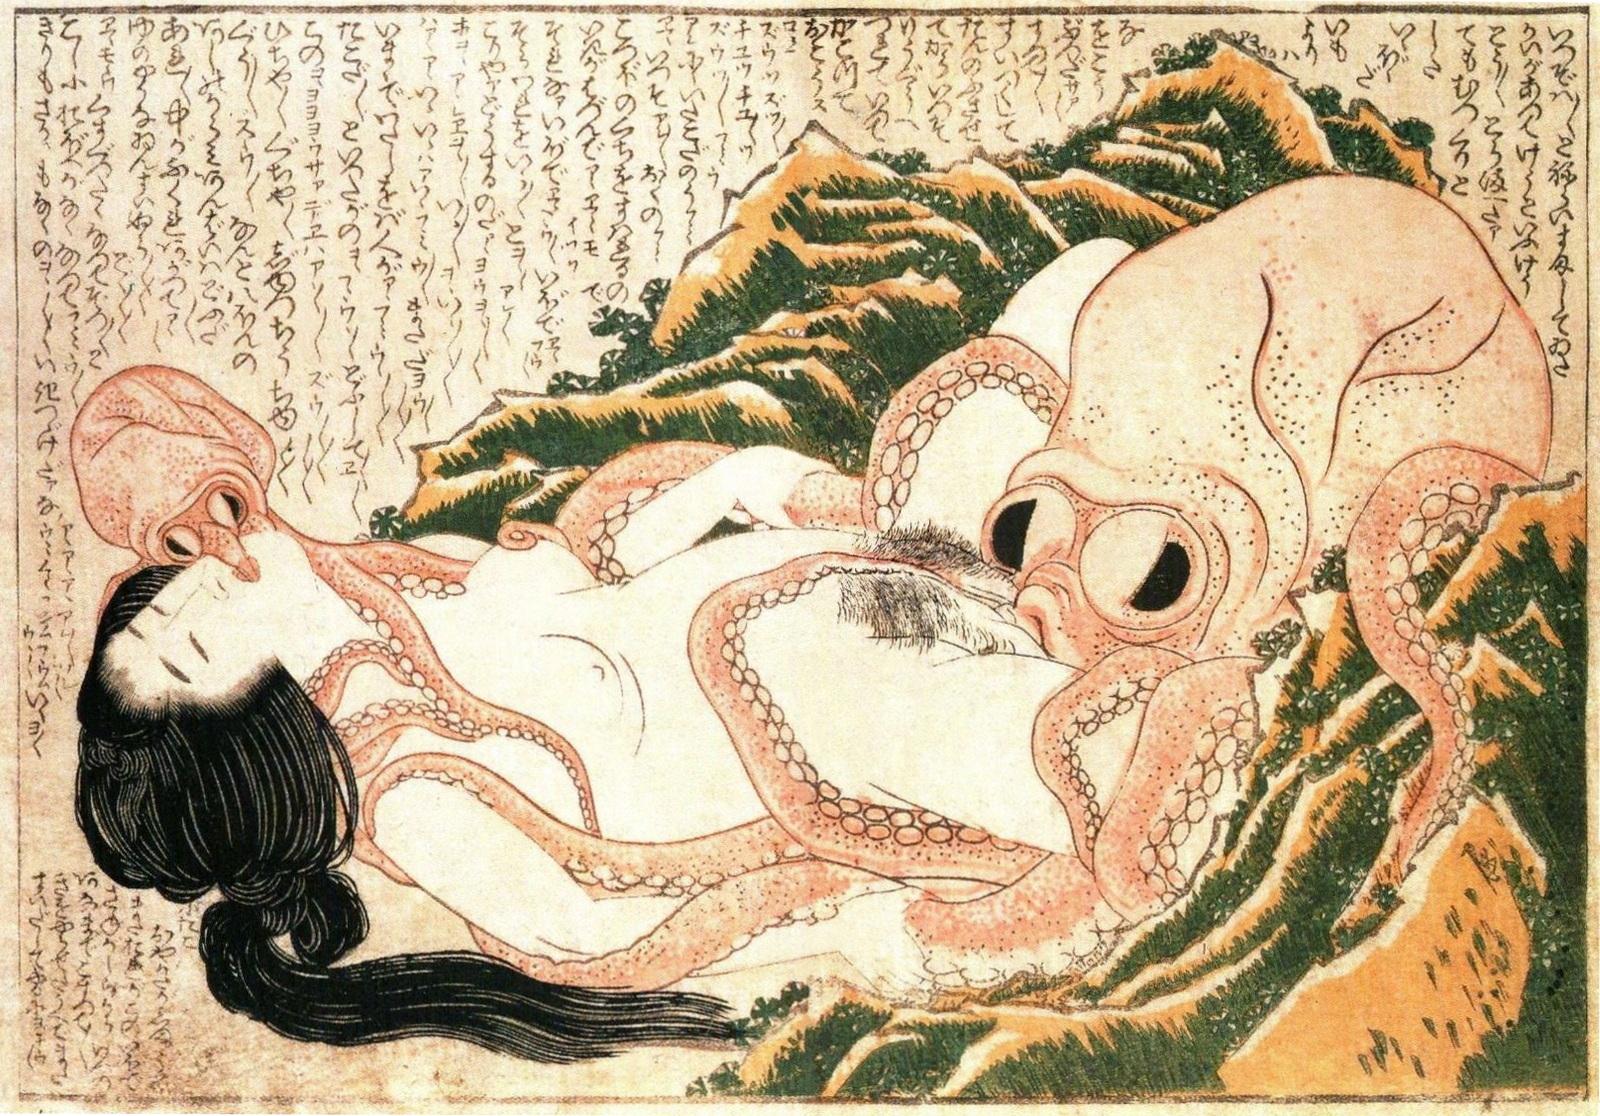 Oldest Hentai